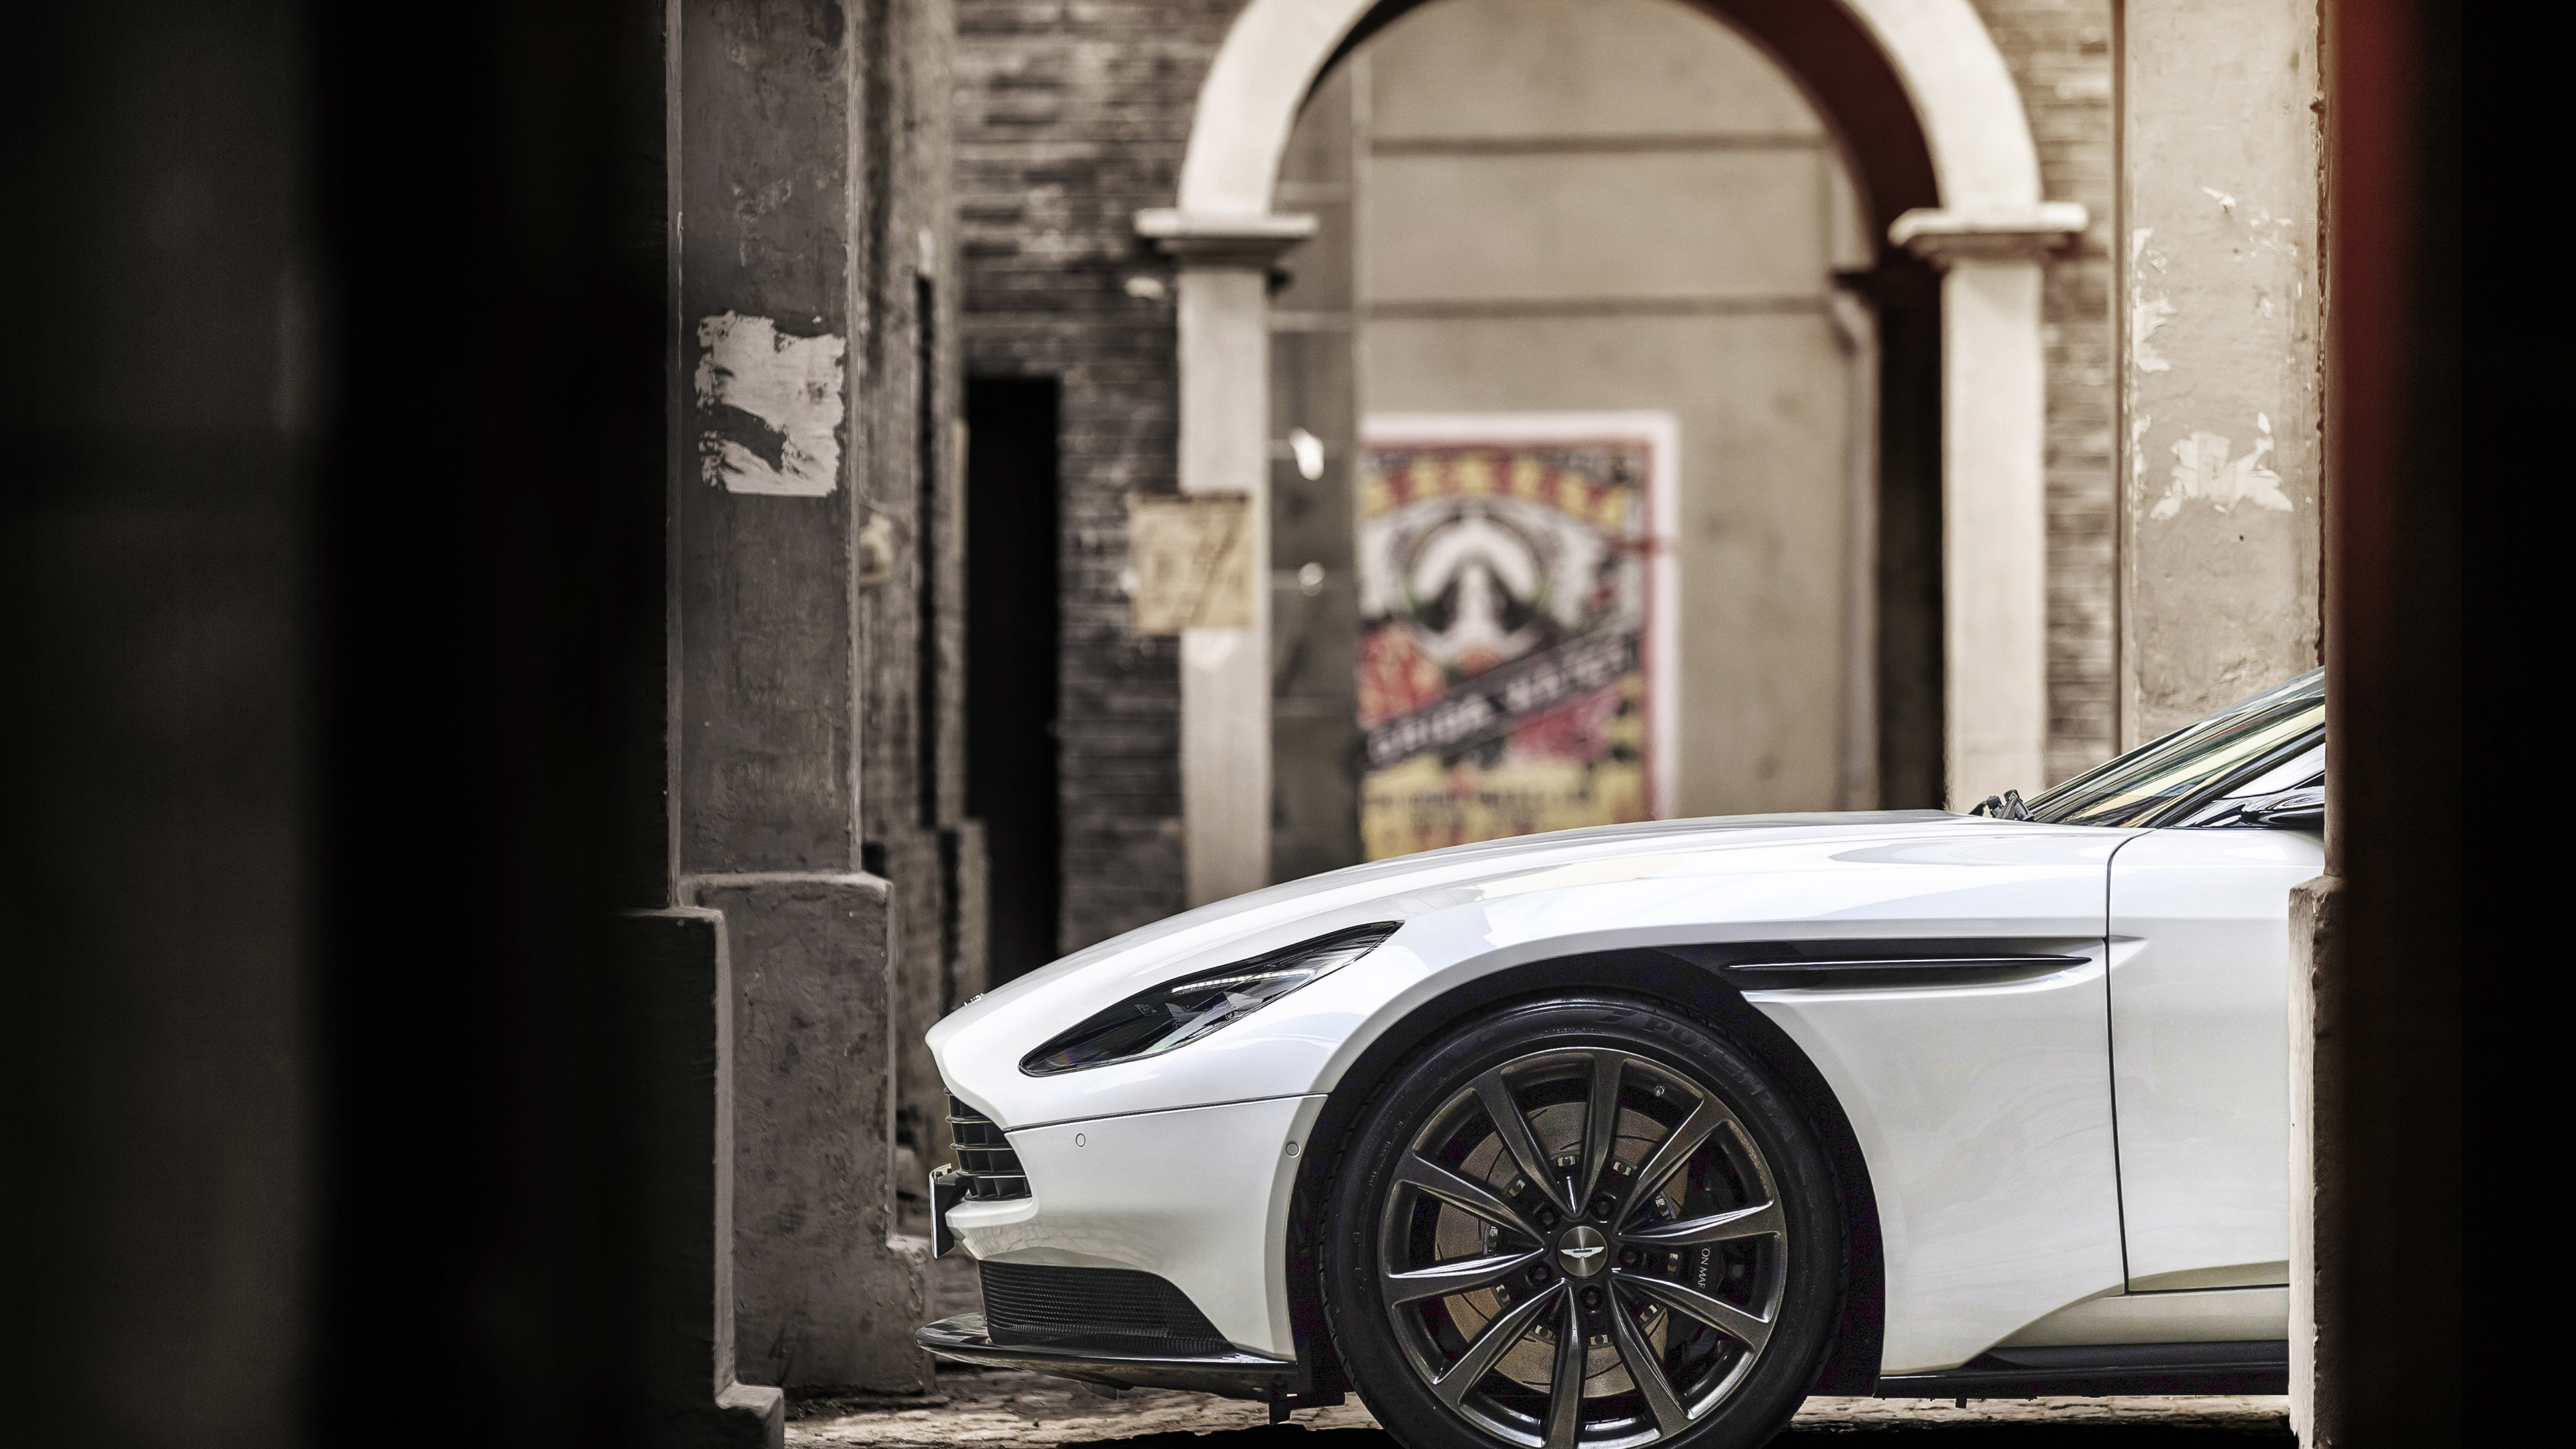 2018 aston martin db11 v8 1539105557 - 2018 Aston Martin DB11 V8 - hd-wallpapers, cars wallpapers, aston martin wallpapers, aston martin db11 wallpapers, 4k-wallpapers, 2018 cars wallpapers